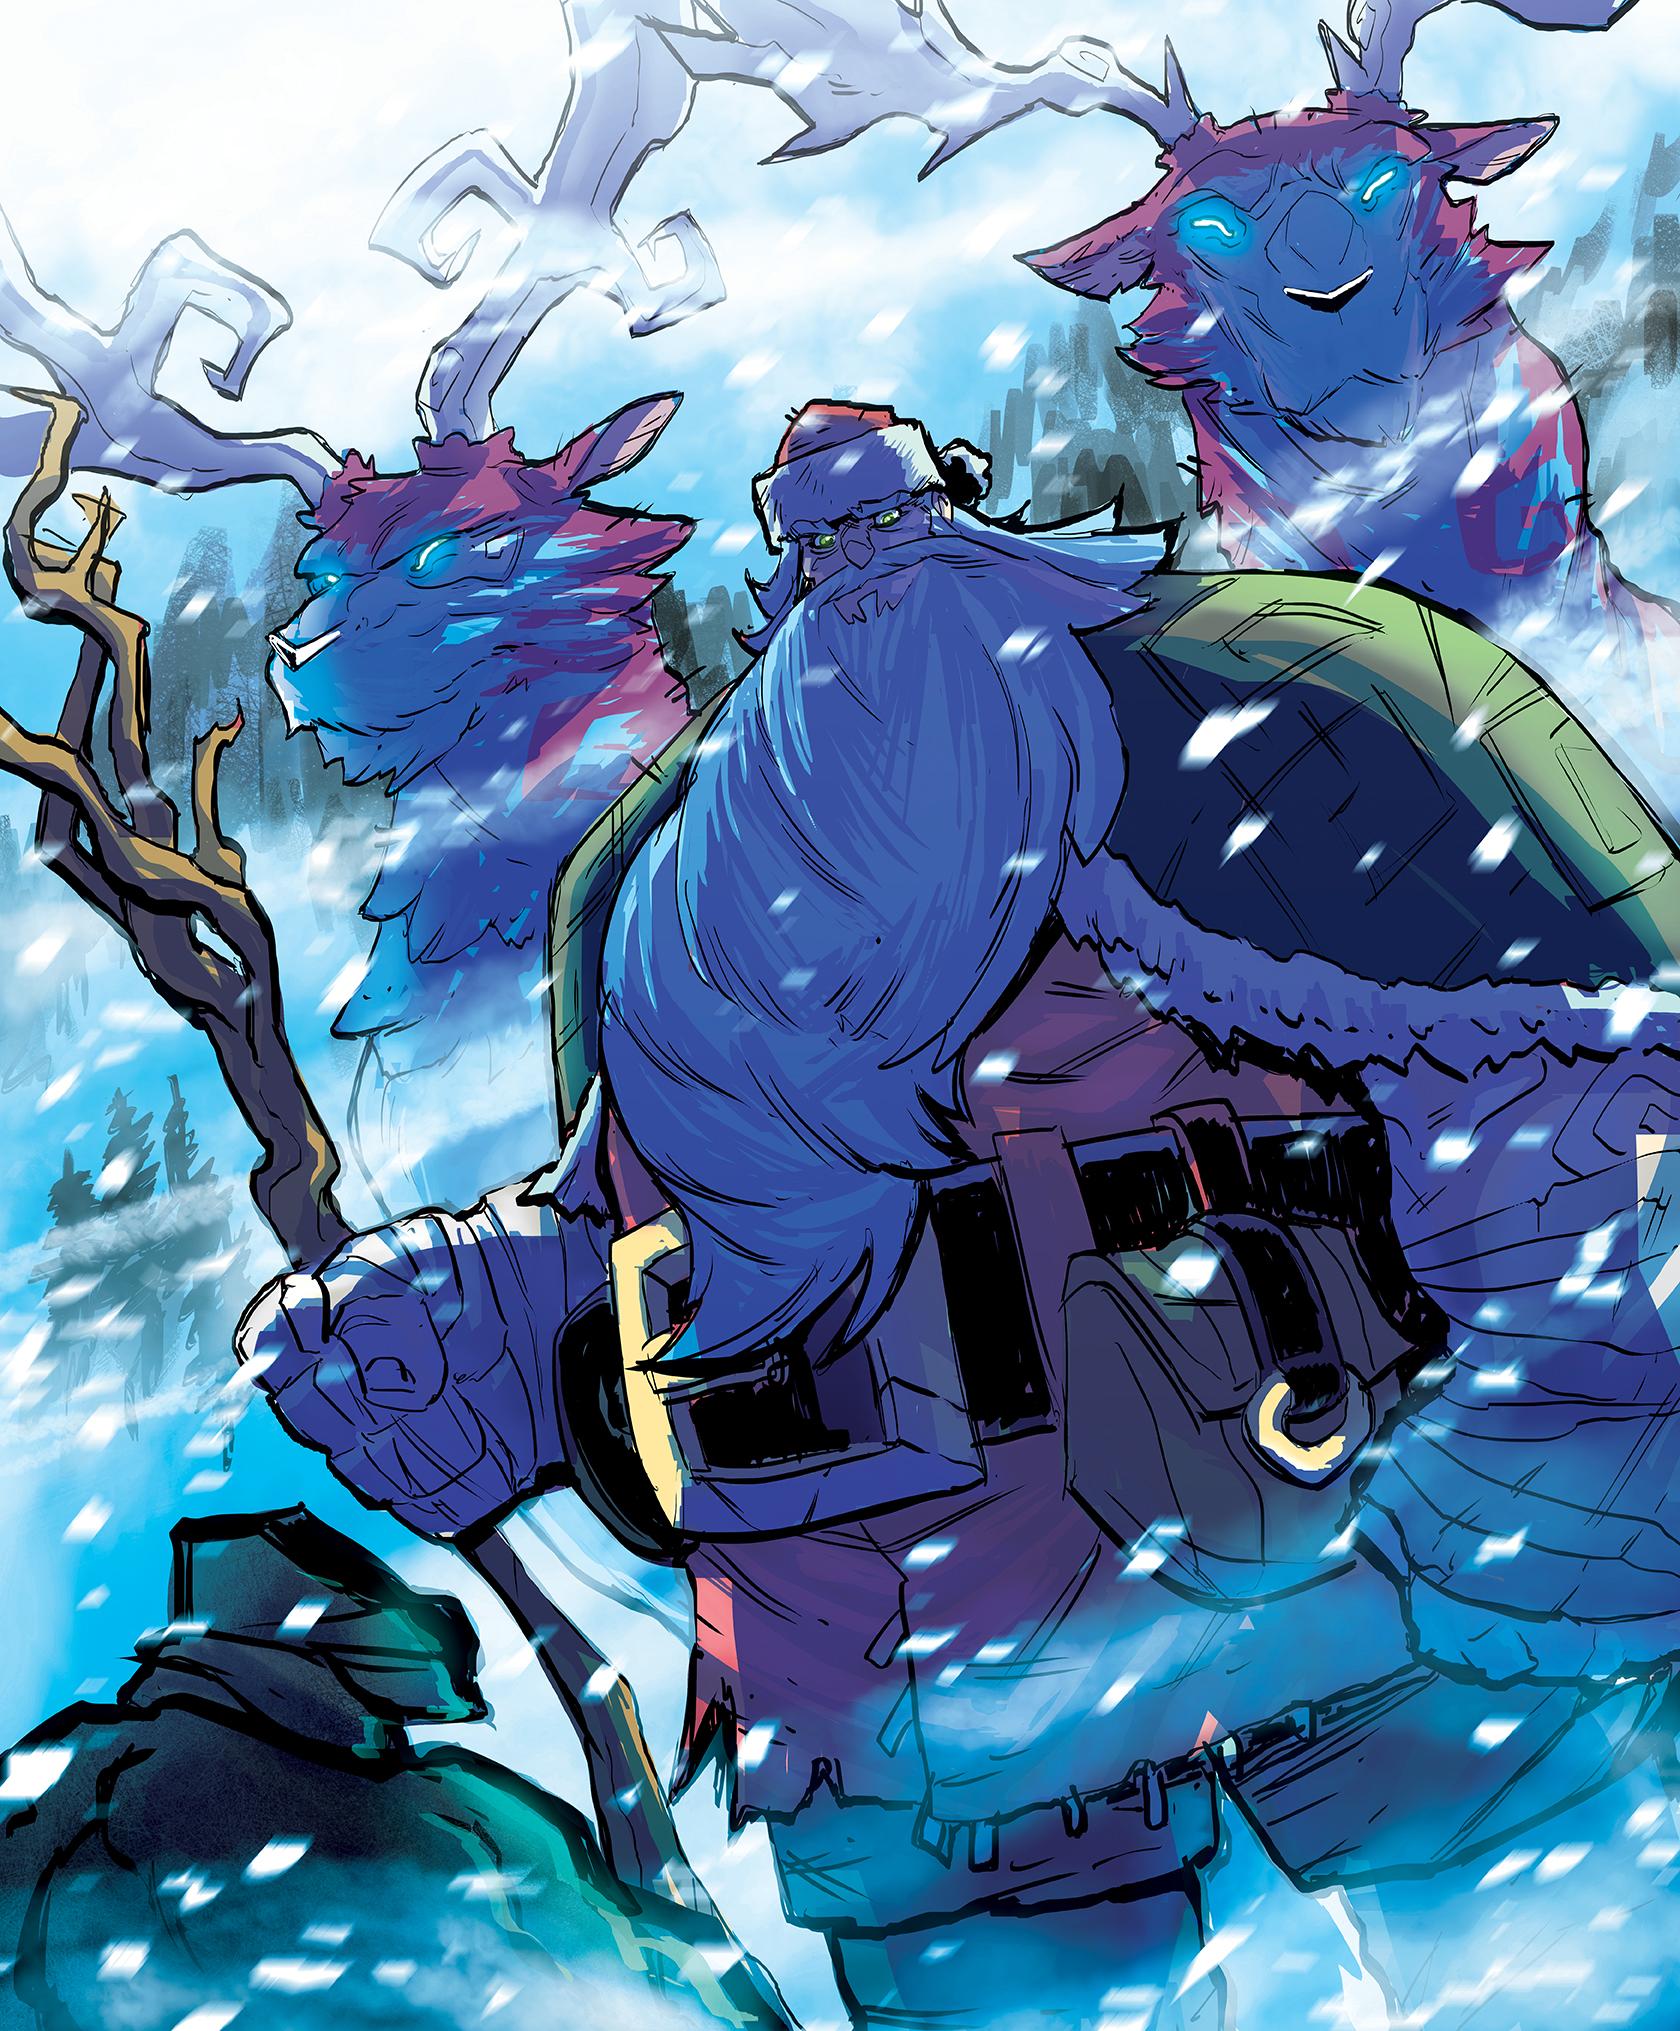 BRIC-A-BRAC #1: A Fantasy Christmas Story